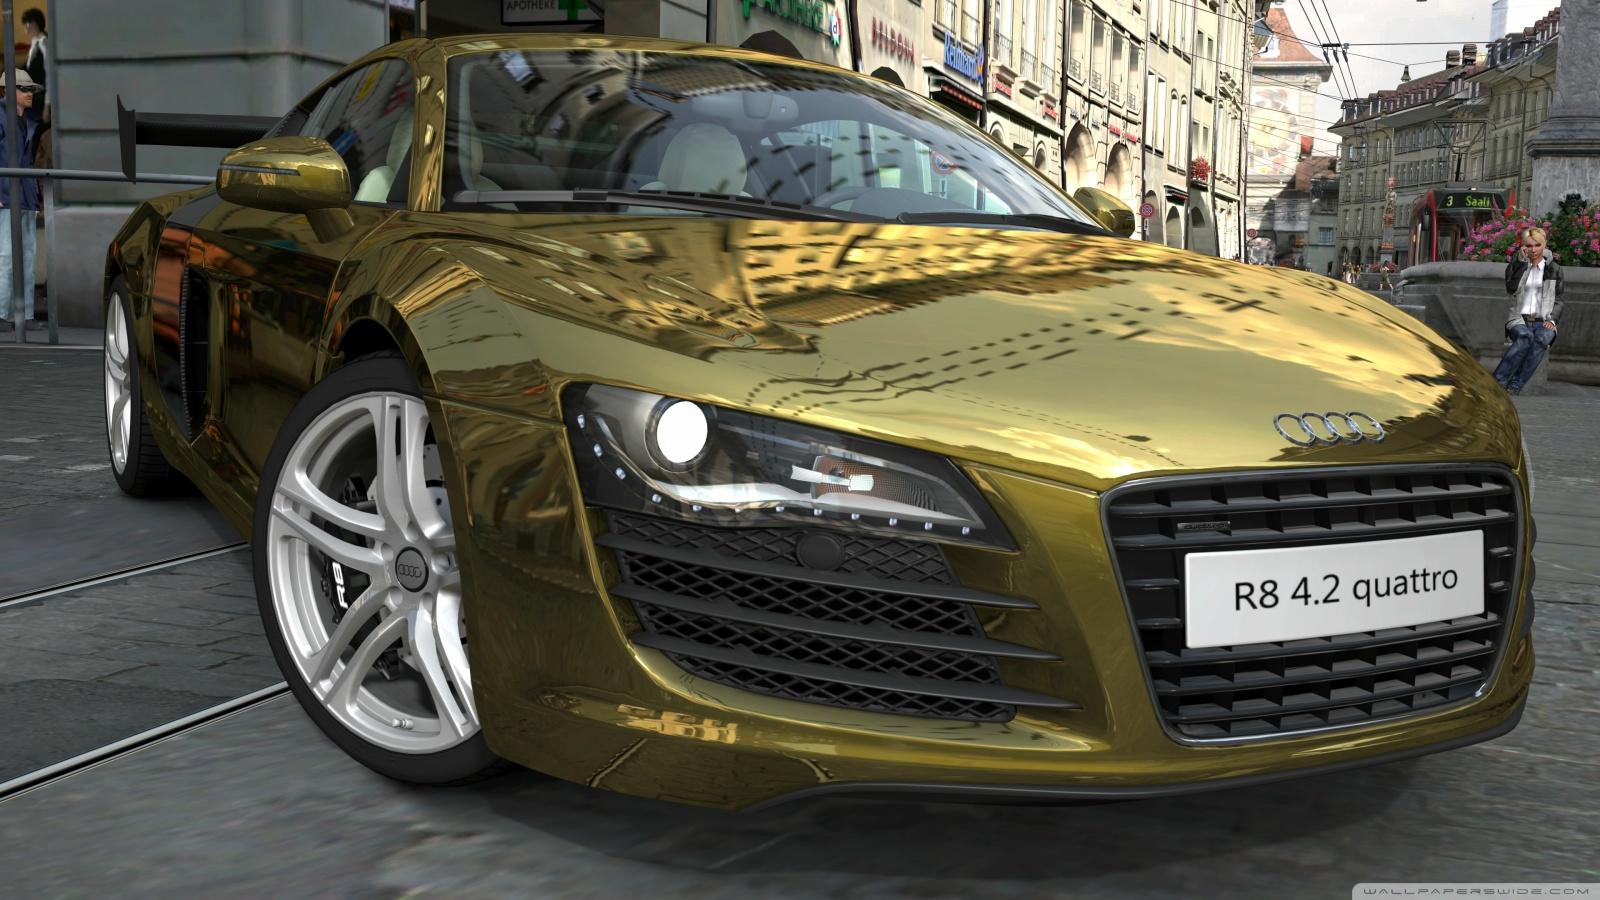 Exotic Cars Wallpaper Pack Audi R8 4 2 Quattro Gold 4k Hd Desktop Wallpaper For 4k